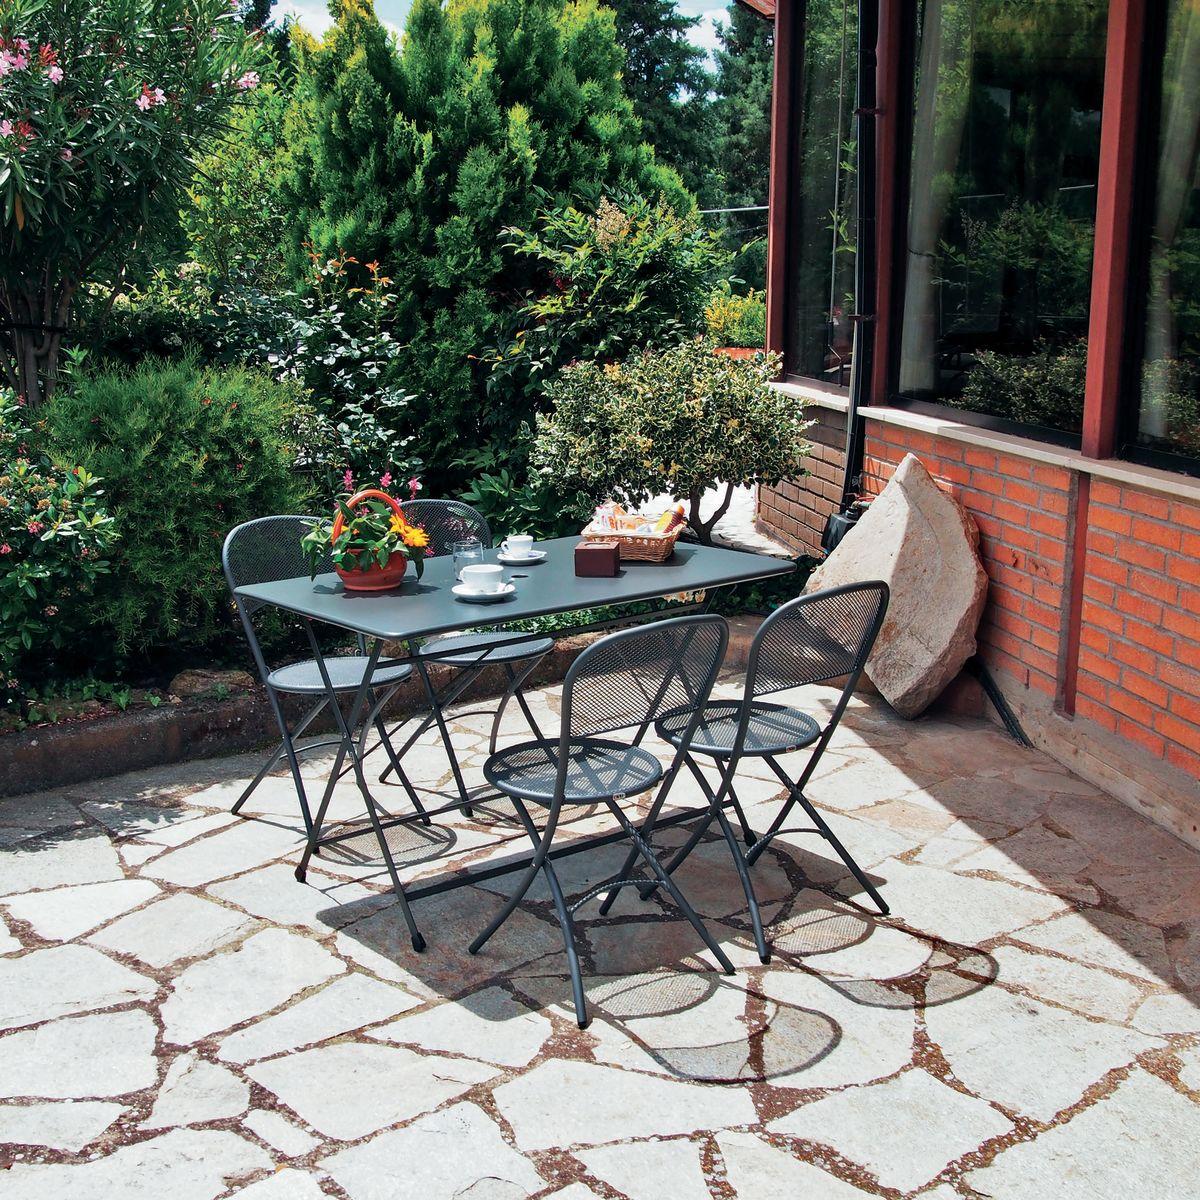 Tavoli giardino offerte set bistrot tavolo ombrellone e for Auchan dondolo da giardino